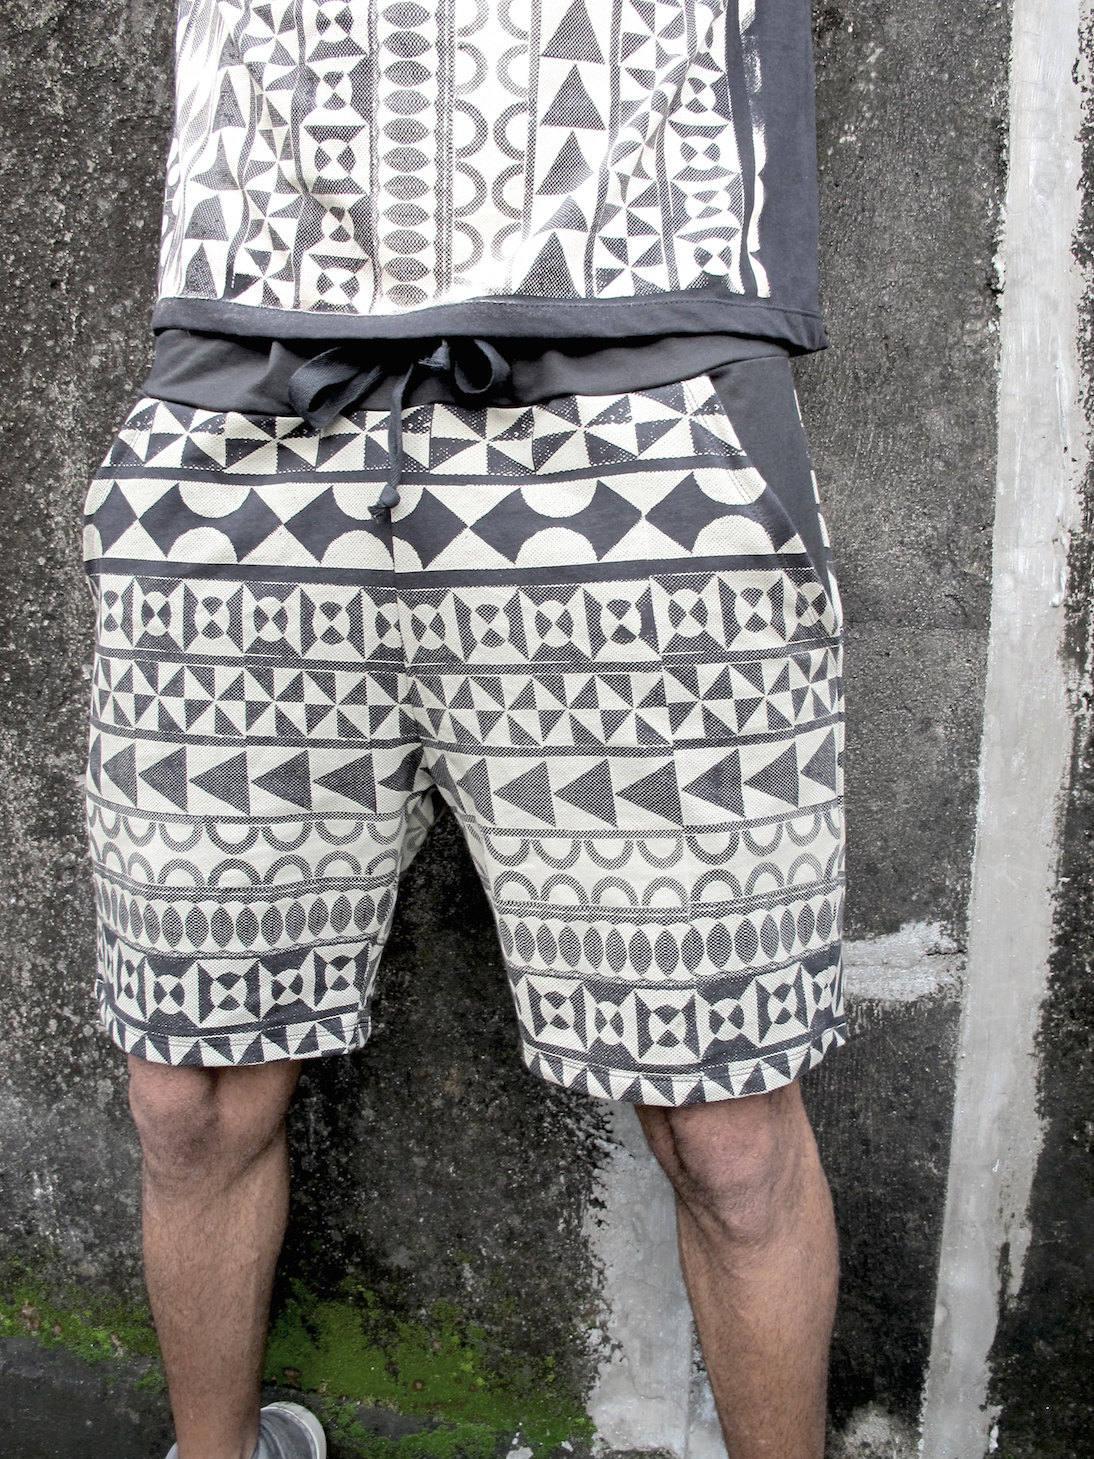 Man Fashion, Unisex Pants, Men's Pants, Ethnic Fashion, Coachella Clothing, Yoga Pants Men, Man Short Pants, Geometric Pants, Street Pants